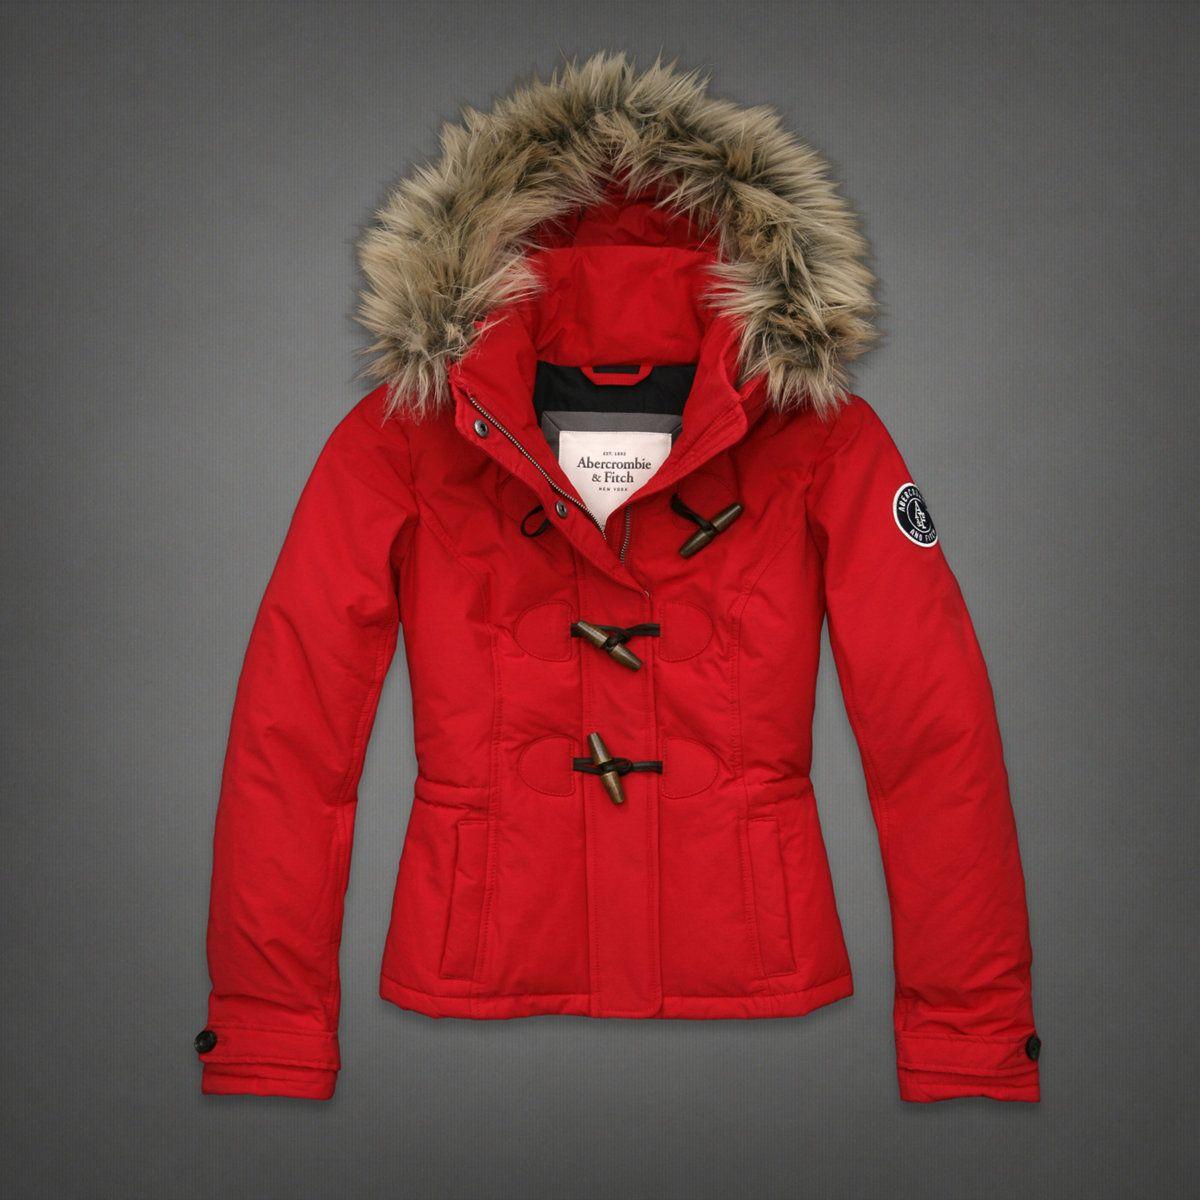 Abercrombie Com Women S Coats Jackets Beautiful Jacket Jackets [ 1200 x 1200 Pixel ]